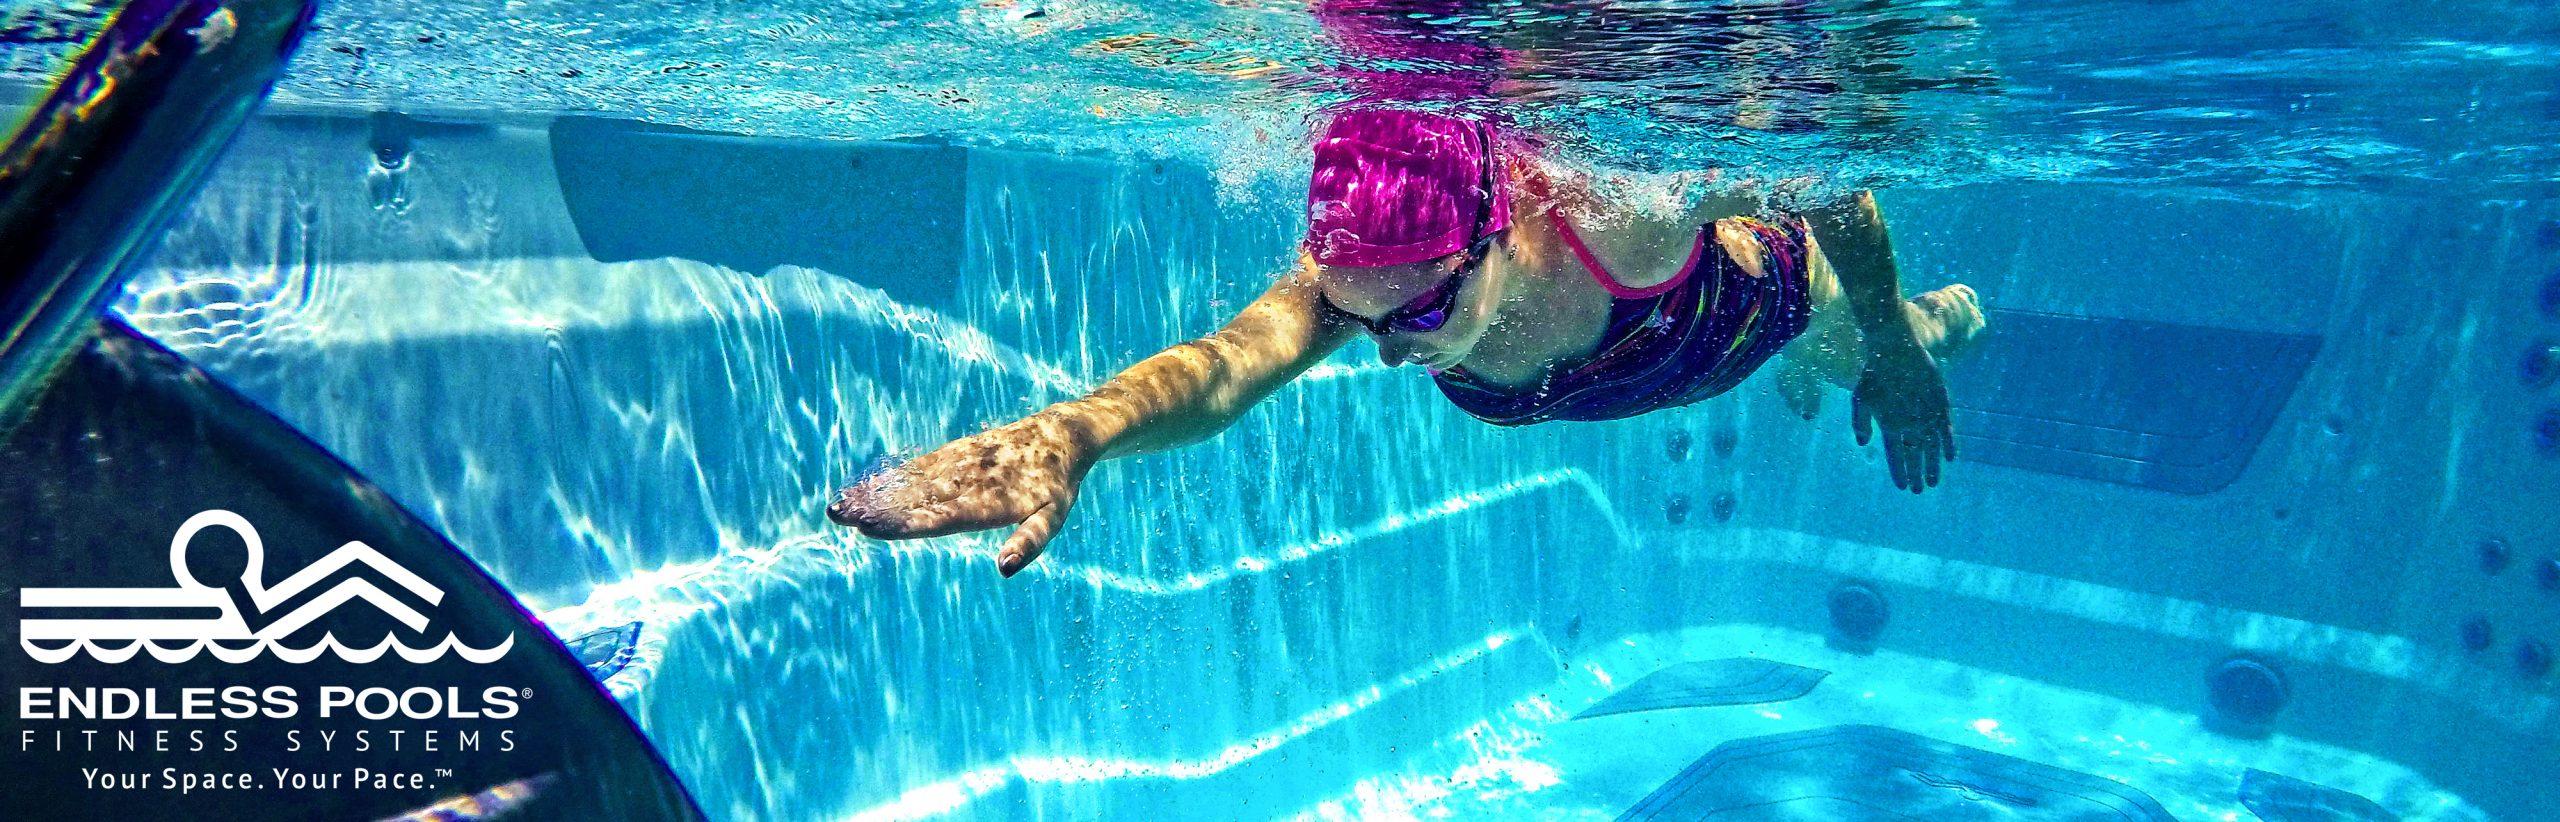 swim spa pool hot tub sale